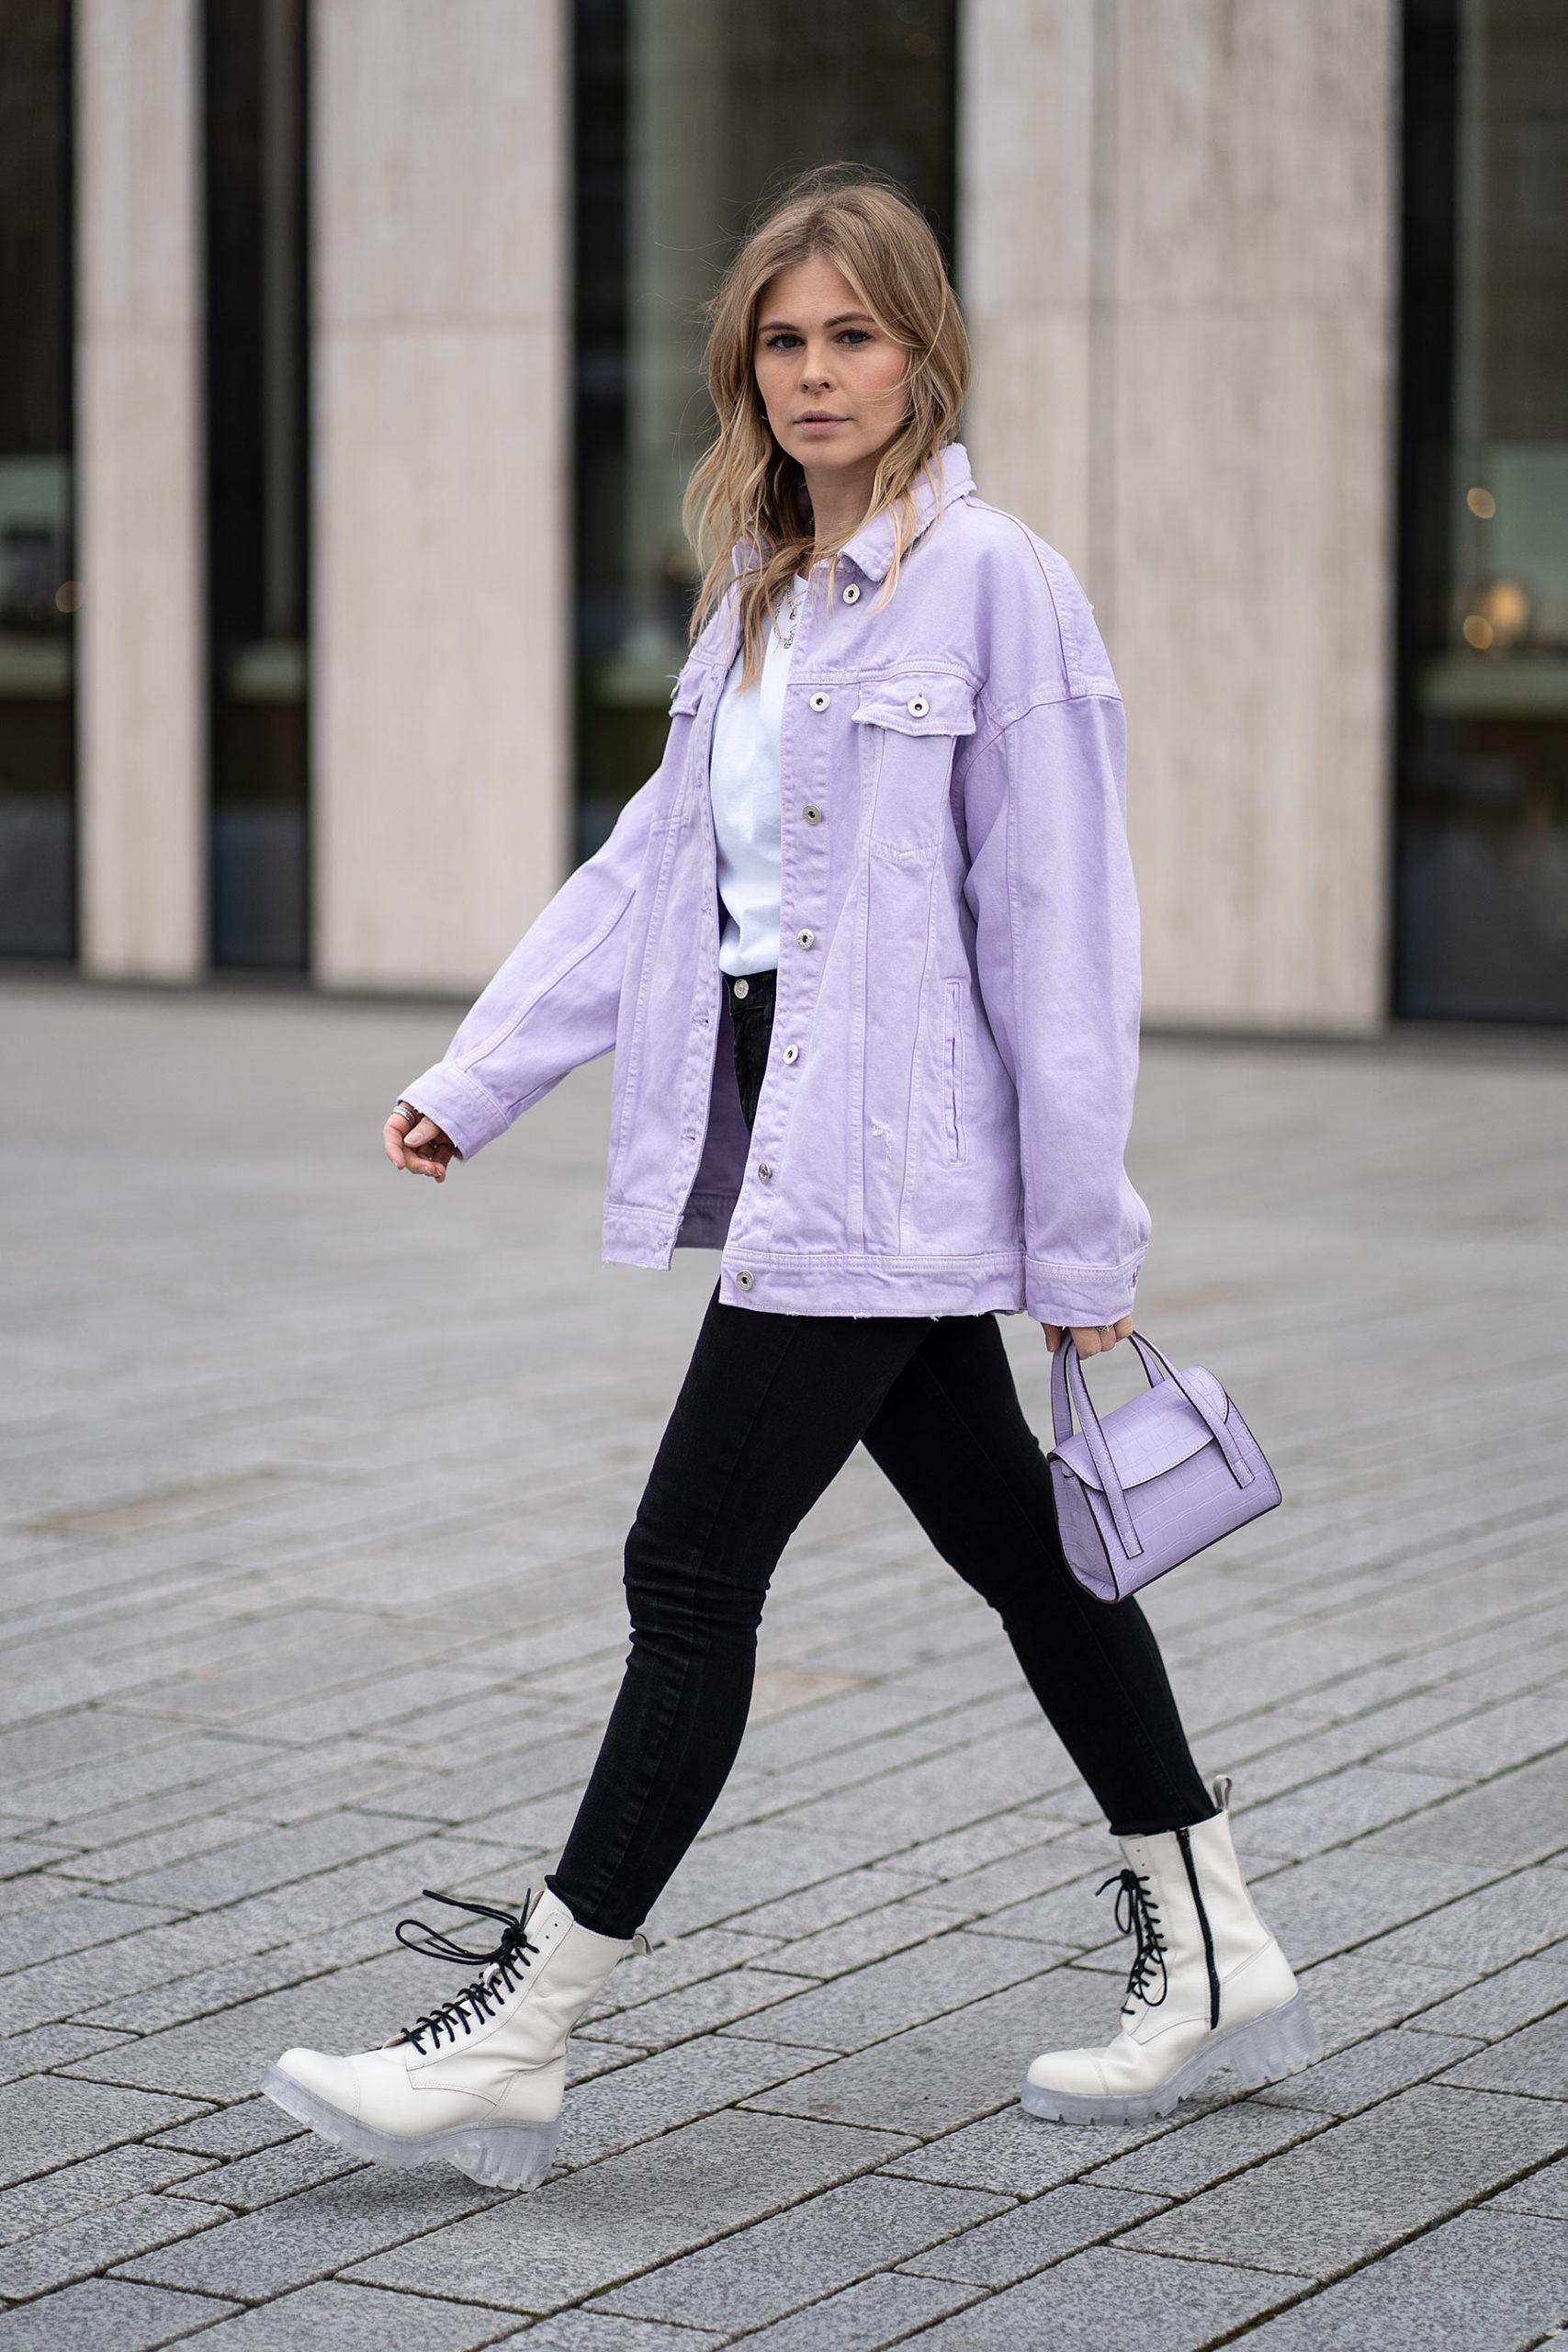 jeansjacke lavendel lila outfit fashion blog sunnyinga